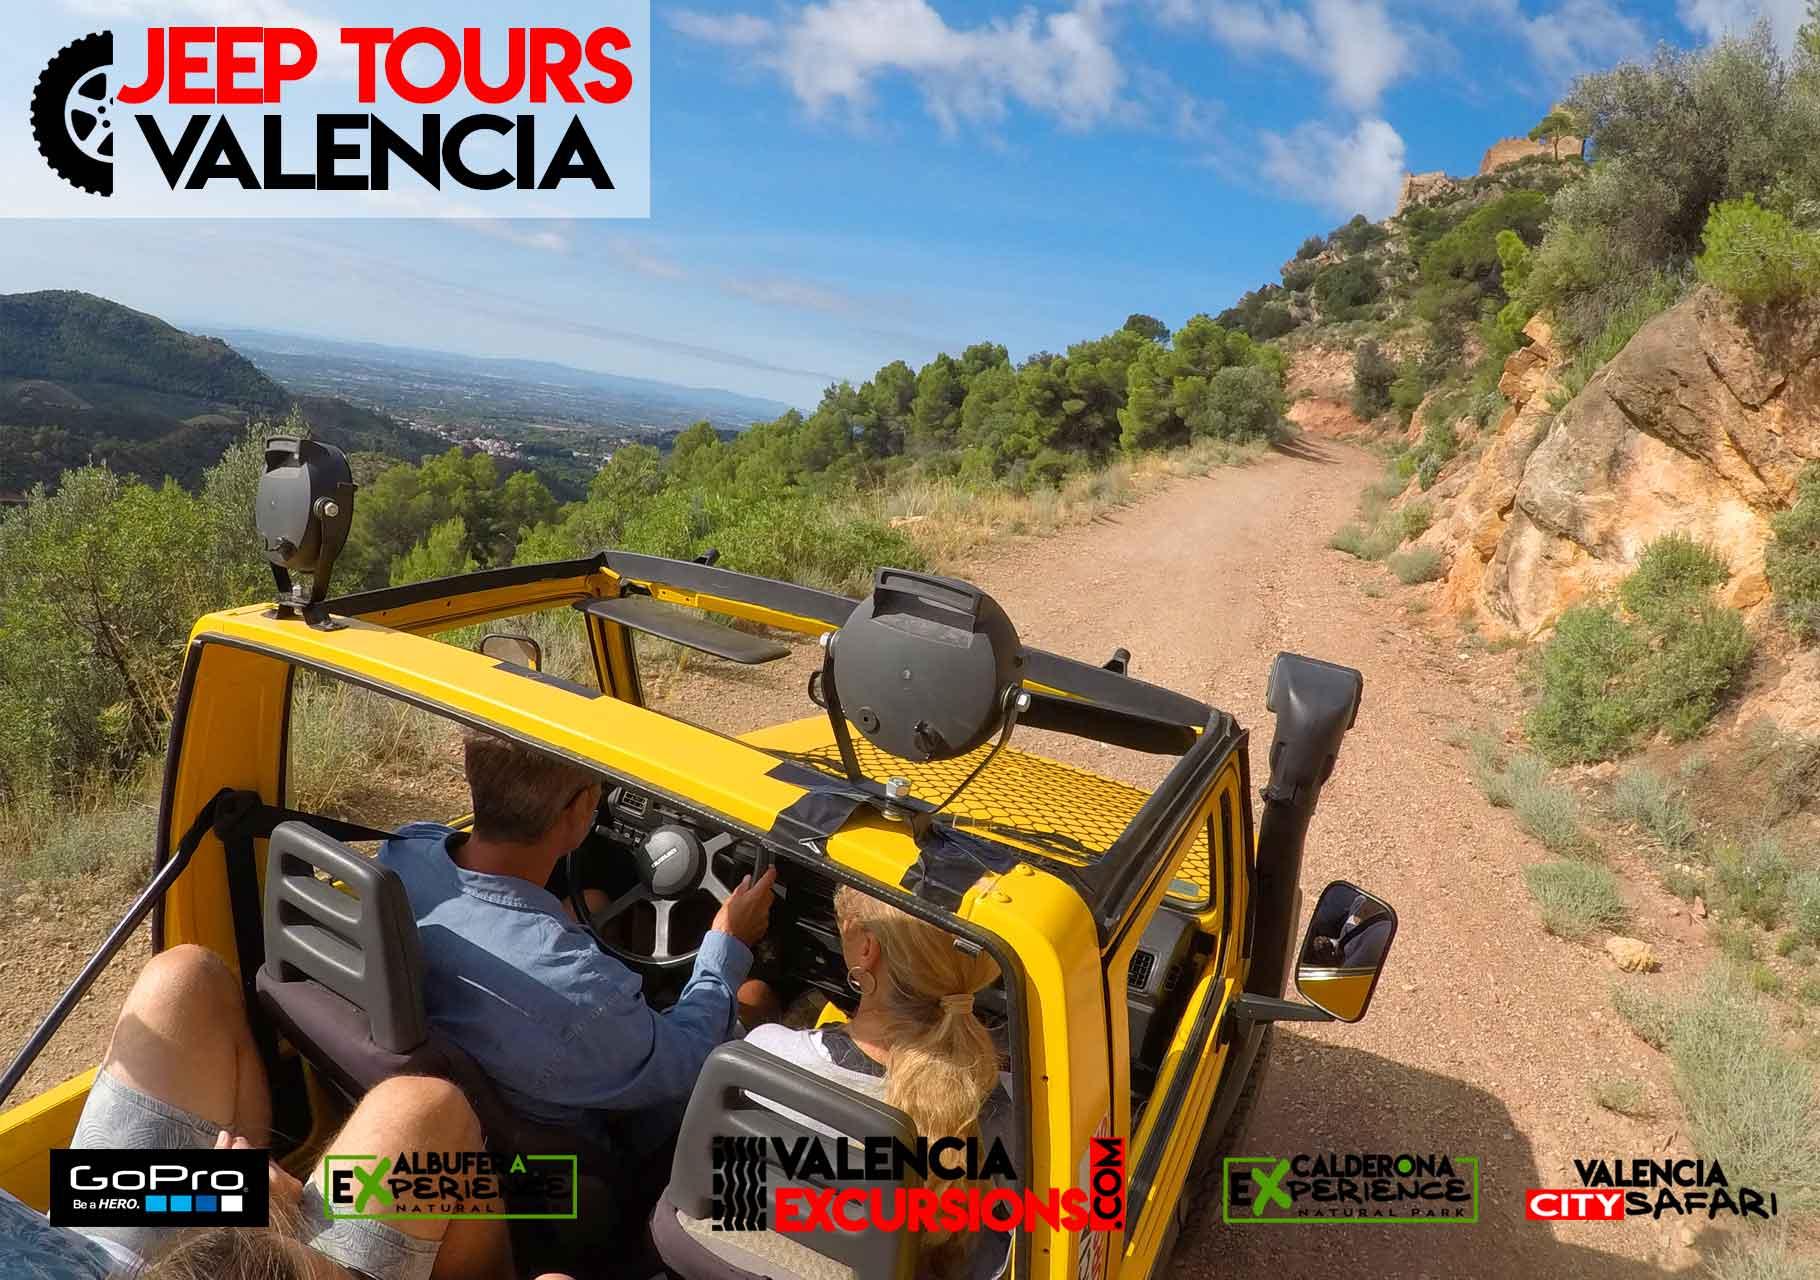 Valencia und Umgebung Jeep Abenteuertour im Calderona National Park Valencia. Geführte Tour